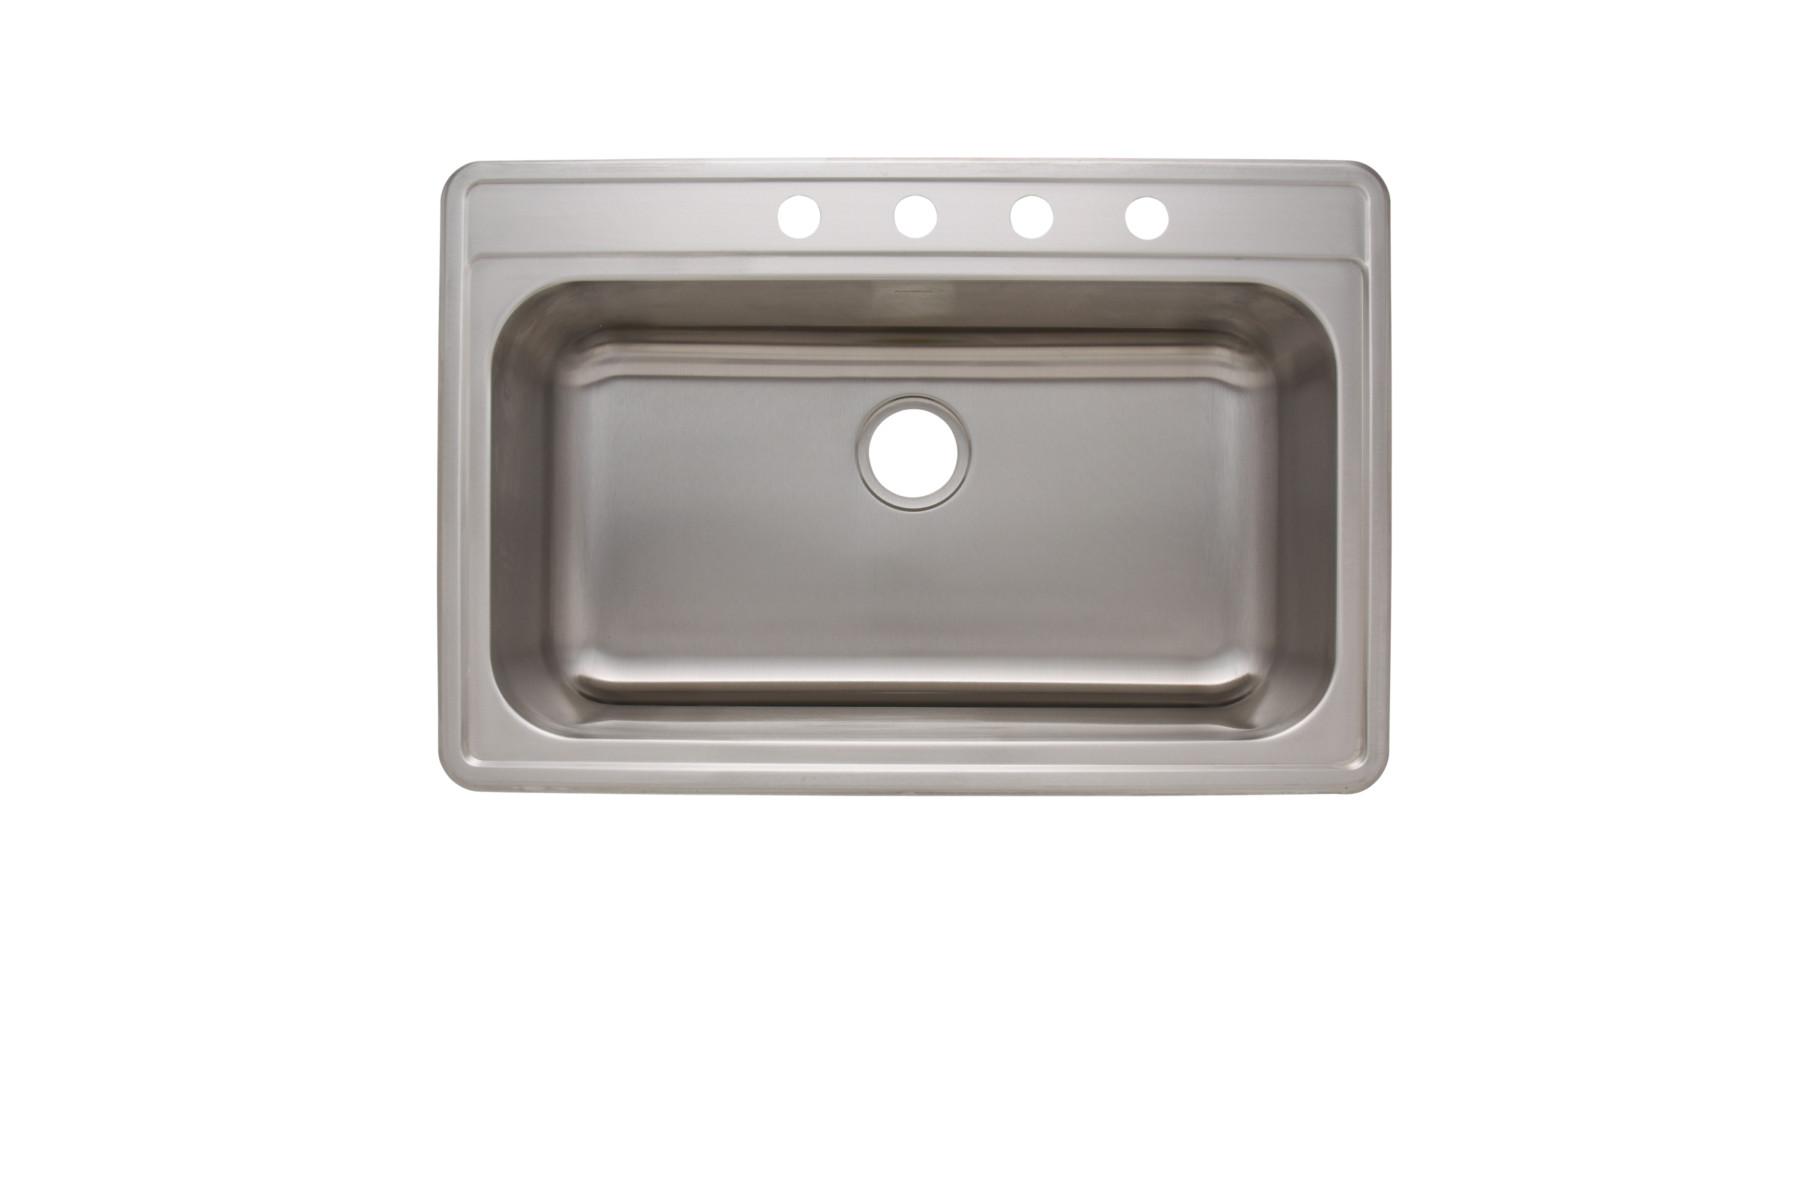 topmount ss kitchen sink           as1376 33   x 22   x 6   18g single bowl topmount economy stainless      rh   amerisink com